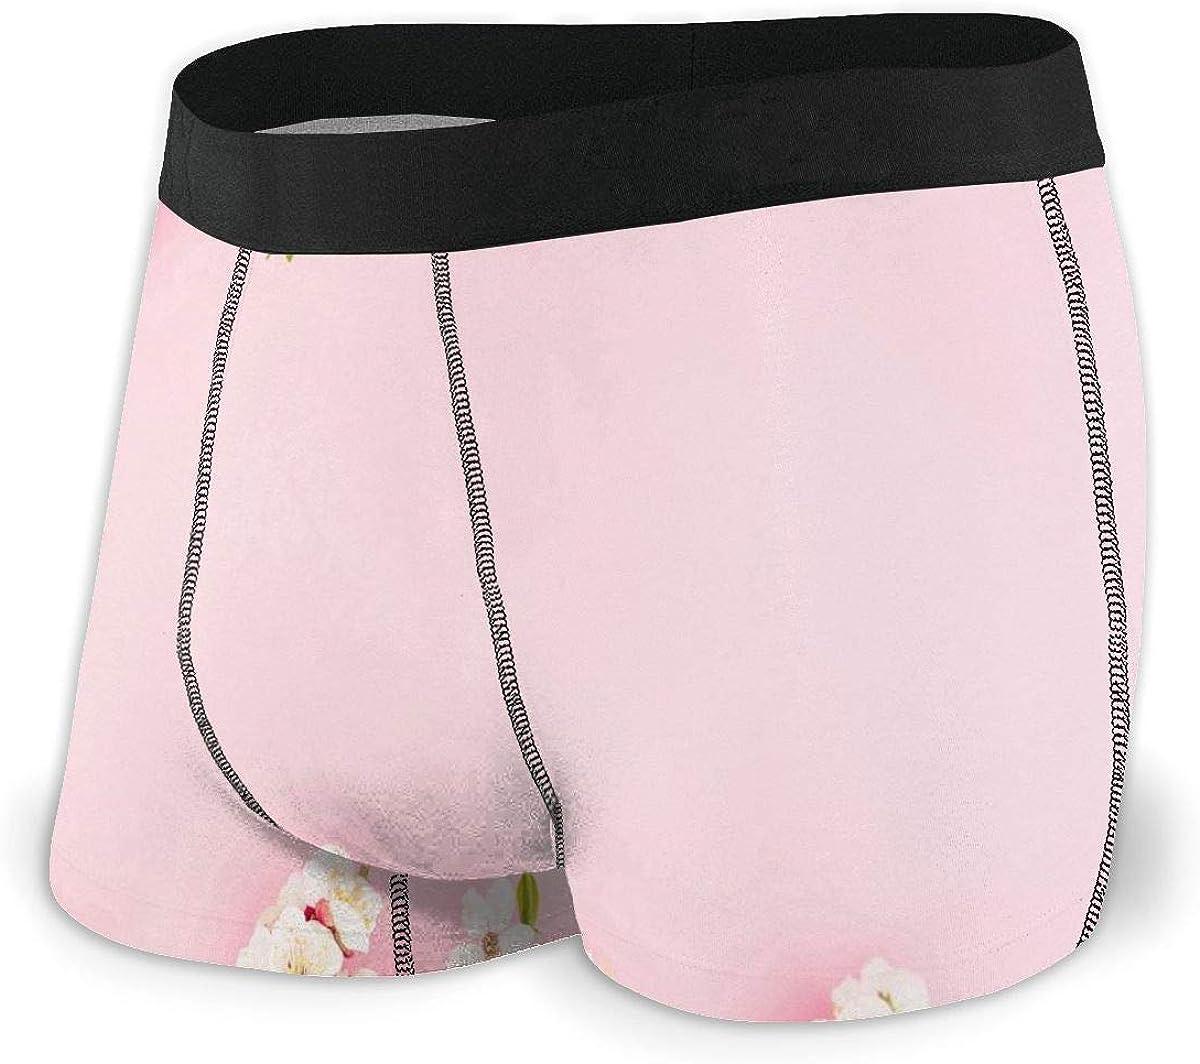 Randolph Wordsworth Mens Boxer Briefs Special Spring Flowers Pink Boys Trunks Underwear Short Leg Breathable Man